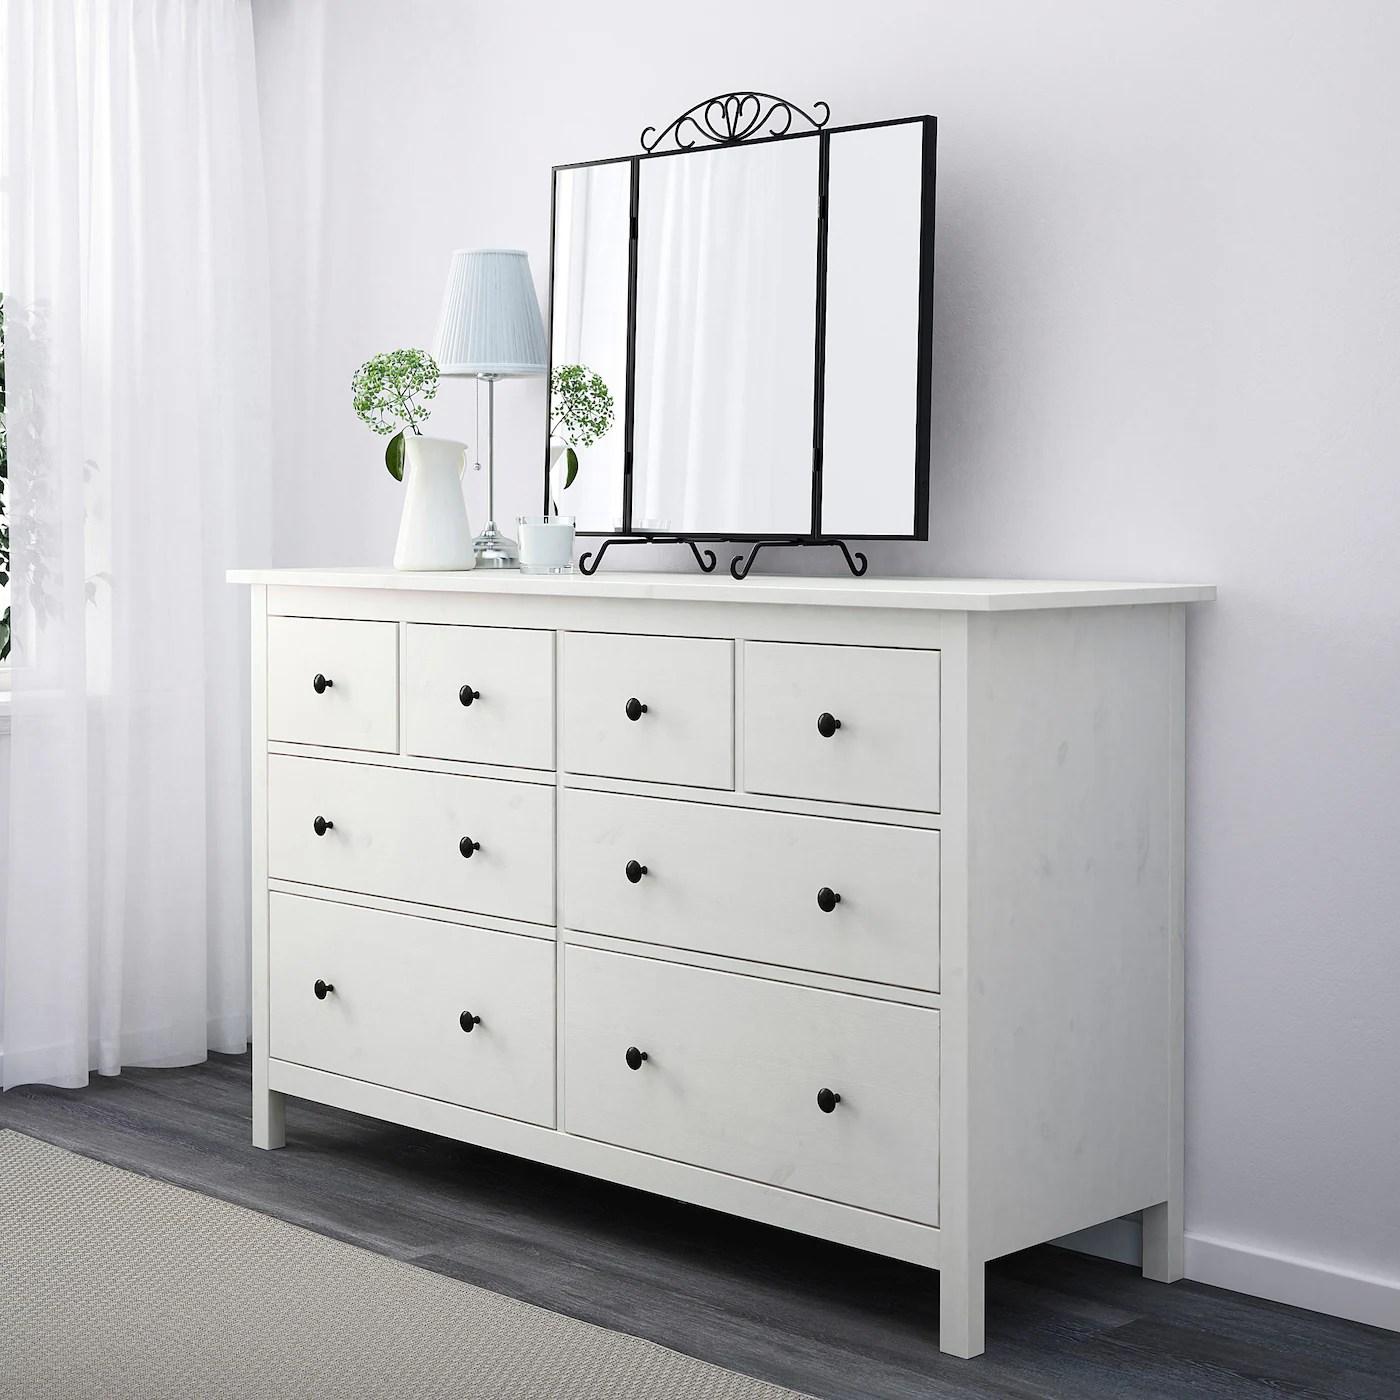 hemnes commode 8 tiroirs teinte blanc 160x96 cm